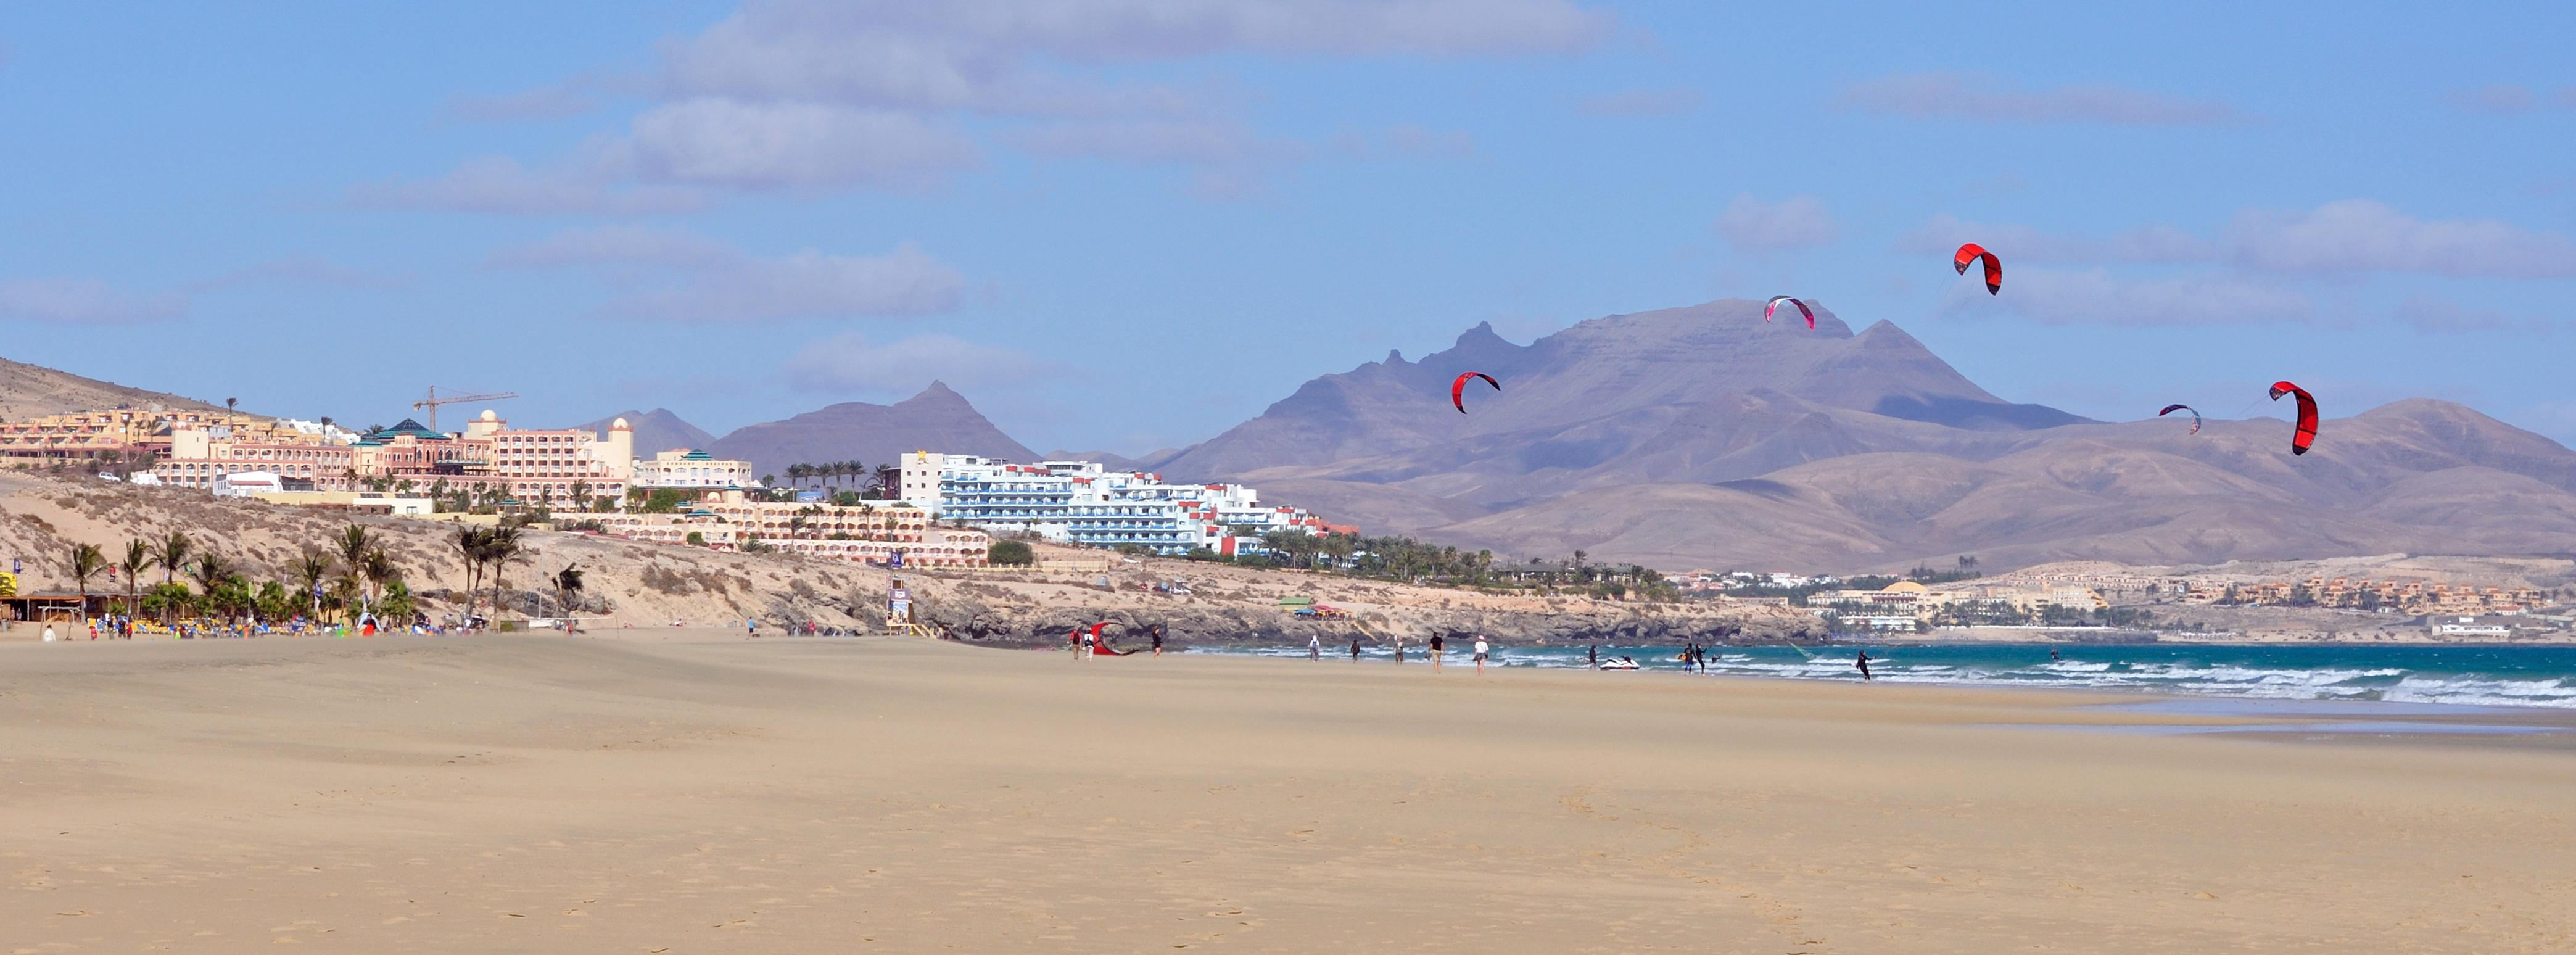 Costa Calma Beach Hotel Fuerteventura